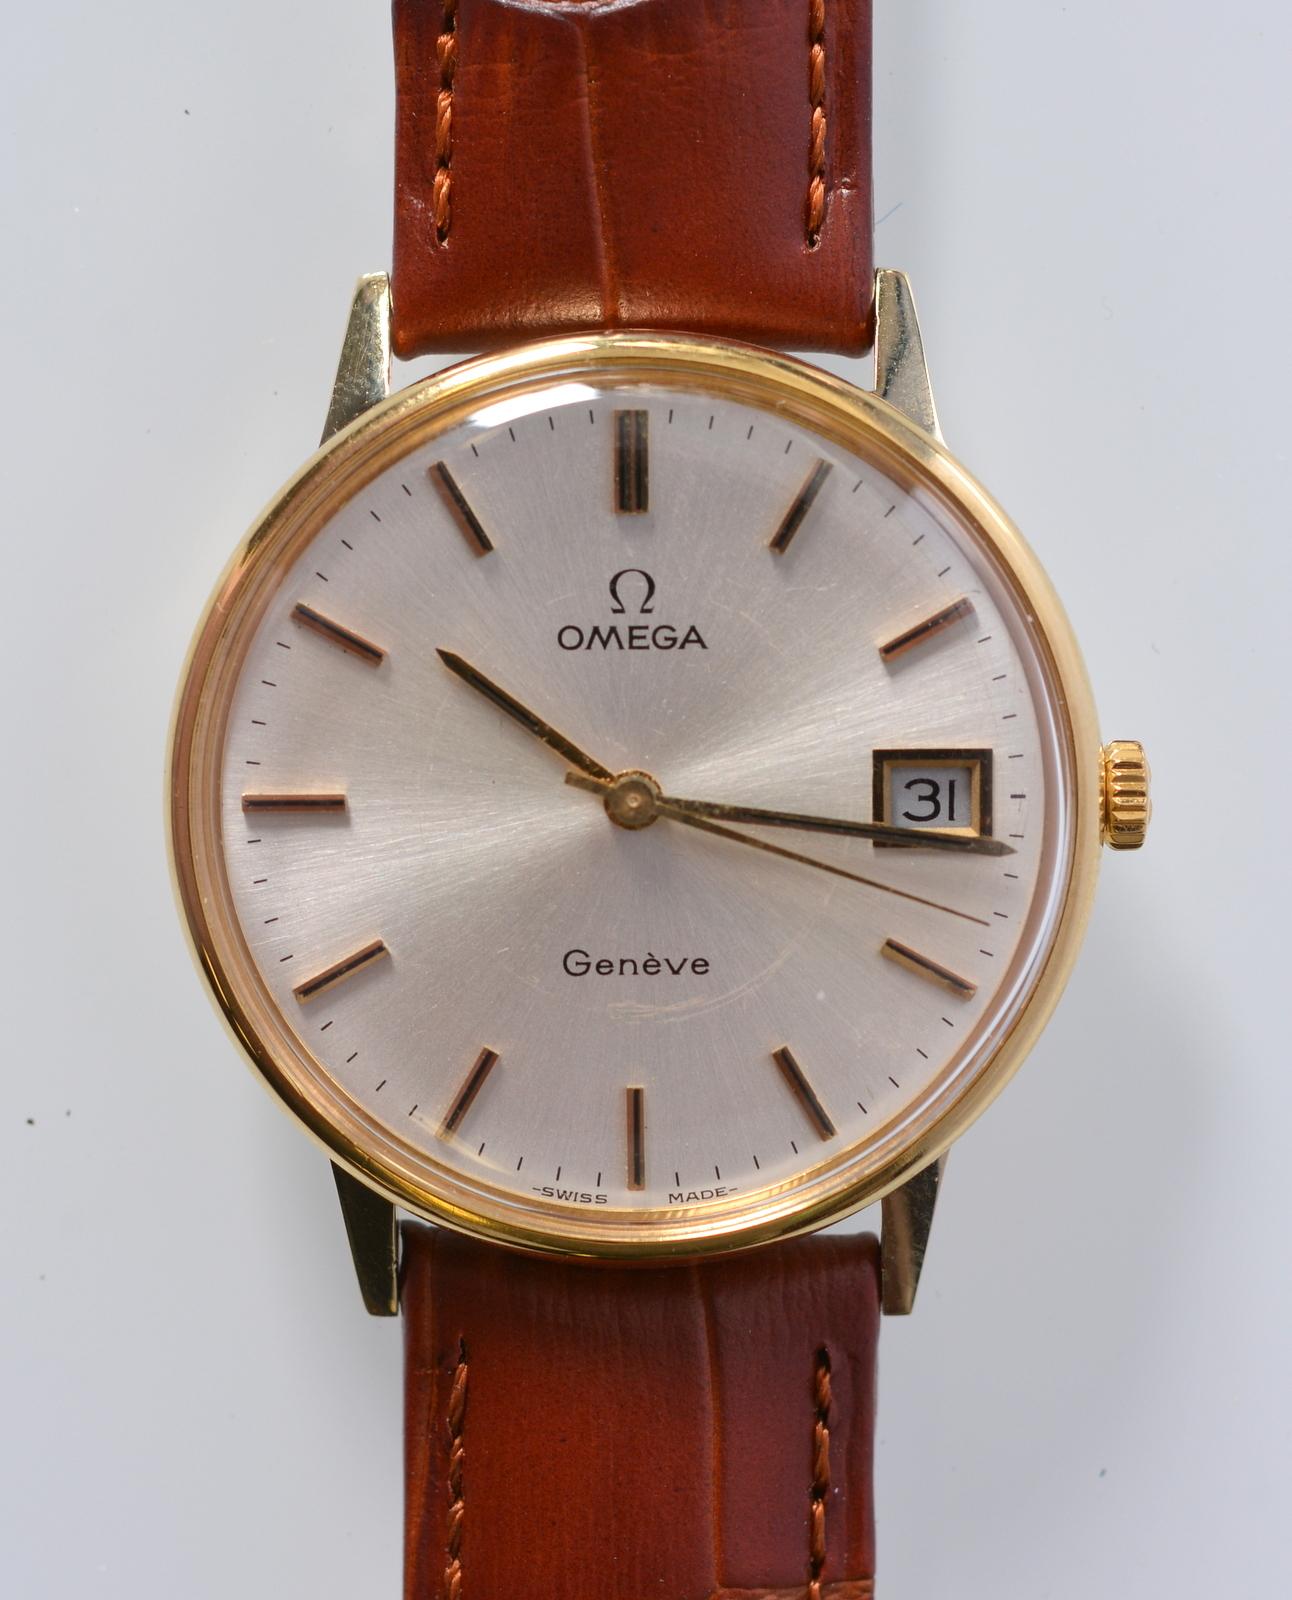 HERRARMBANDSUR, Omega Geneve, 14K  Clocks & Watches